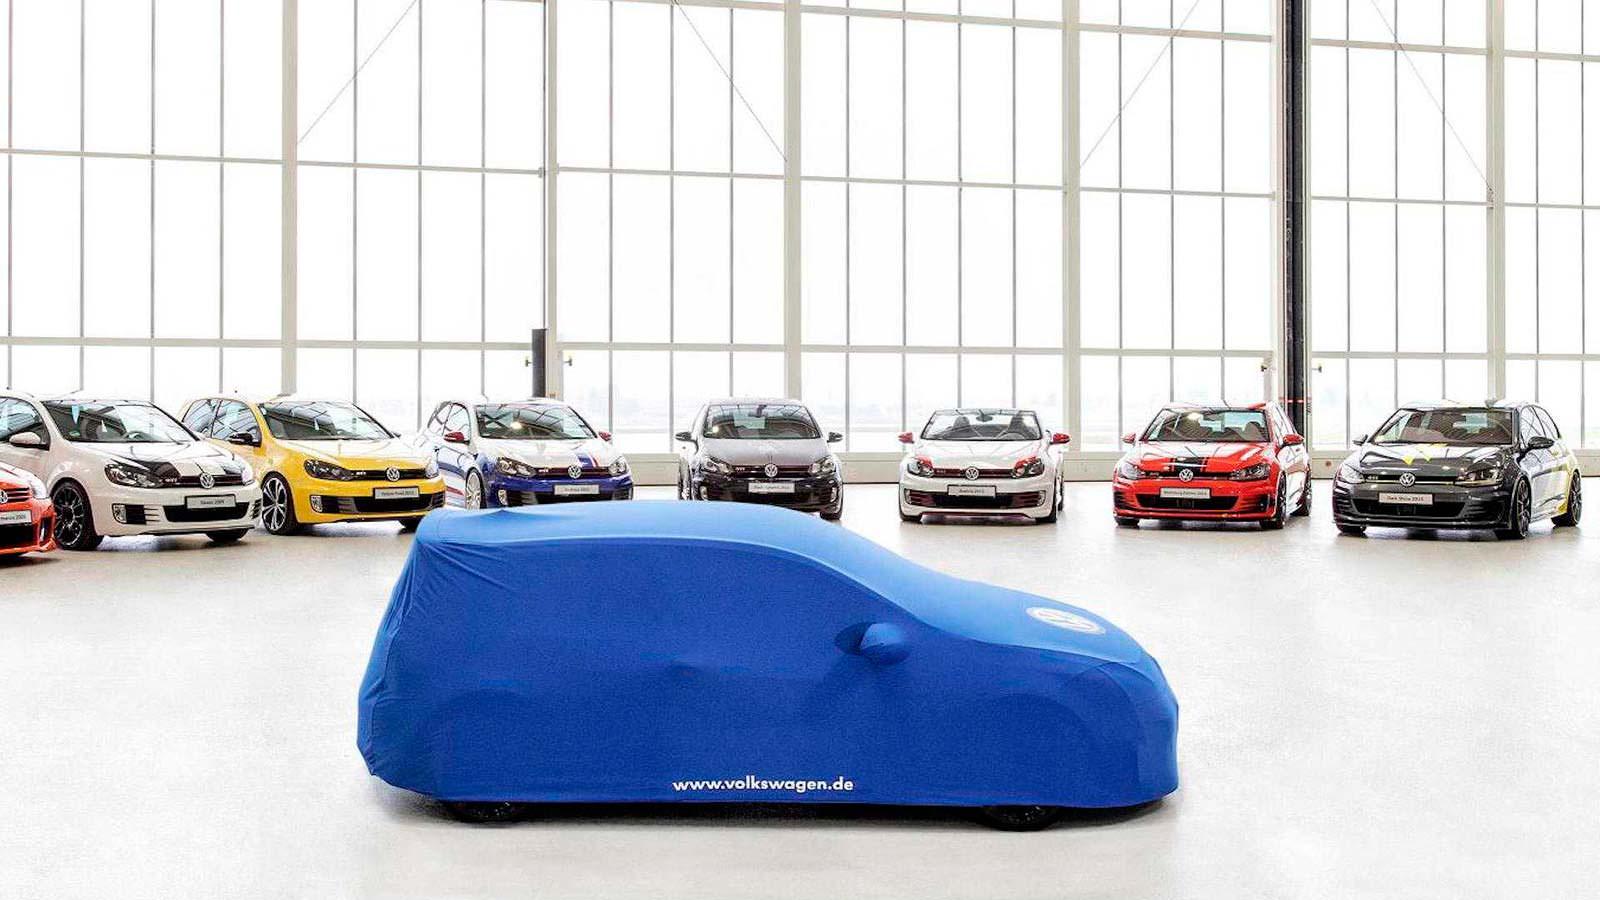 Концепты VW для фестиваля Worthersee за 10 лет